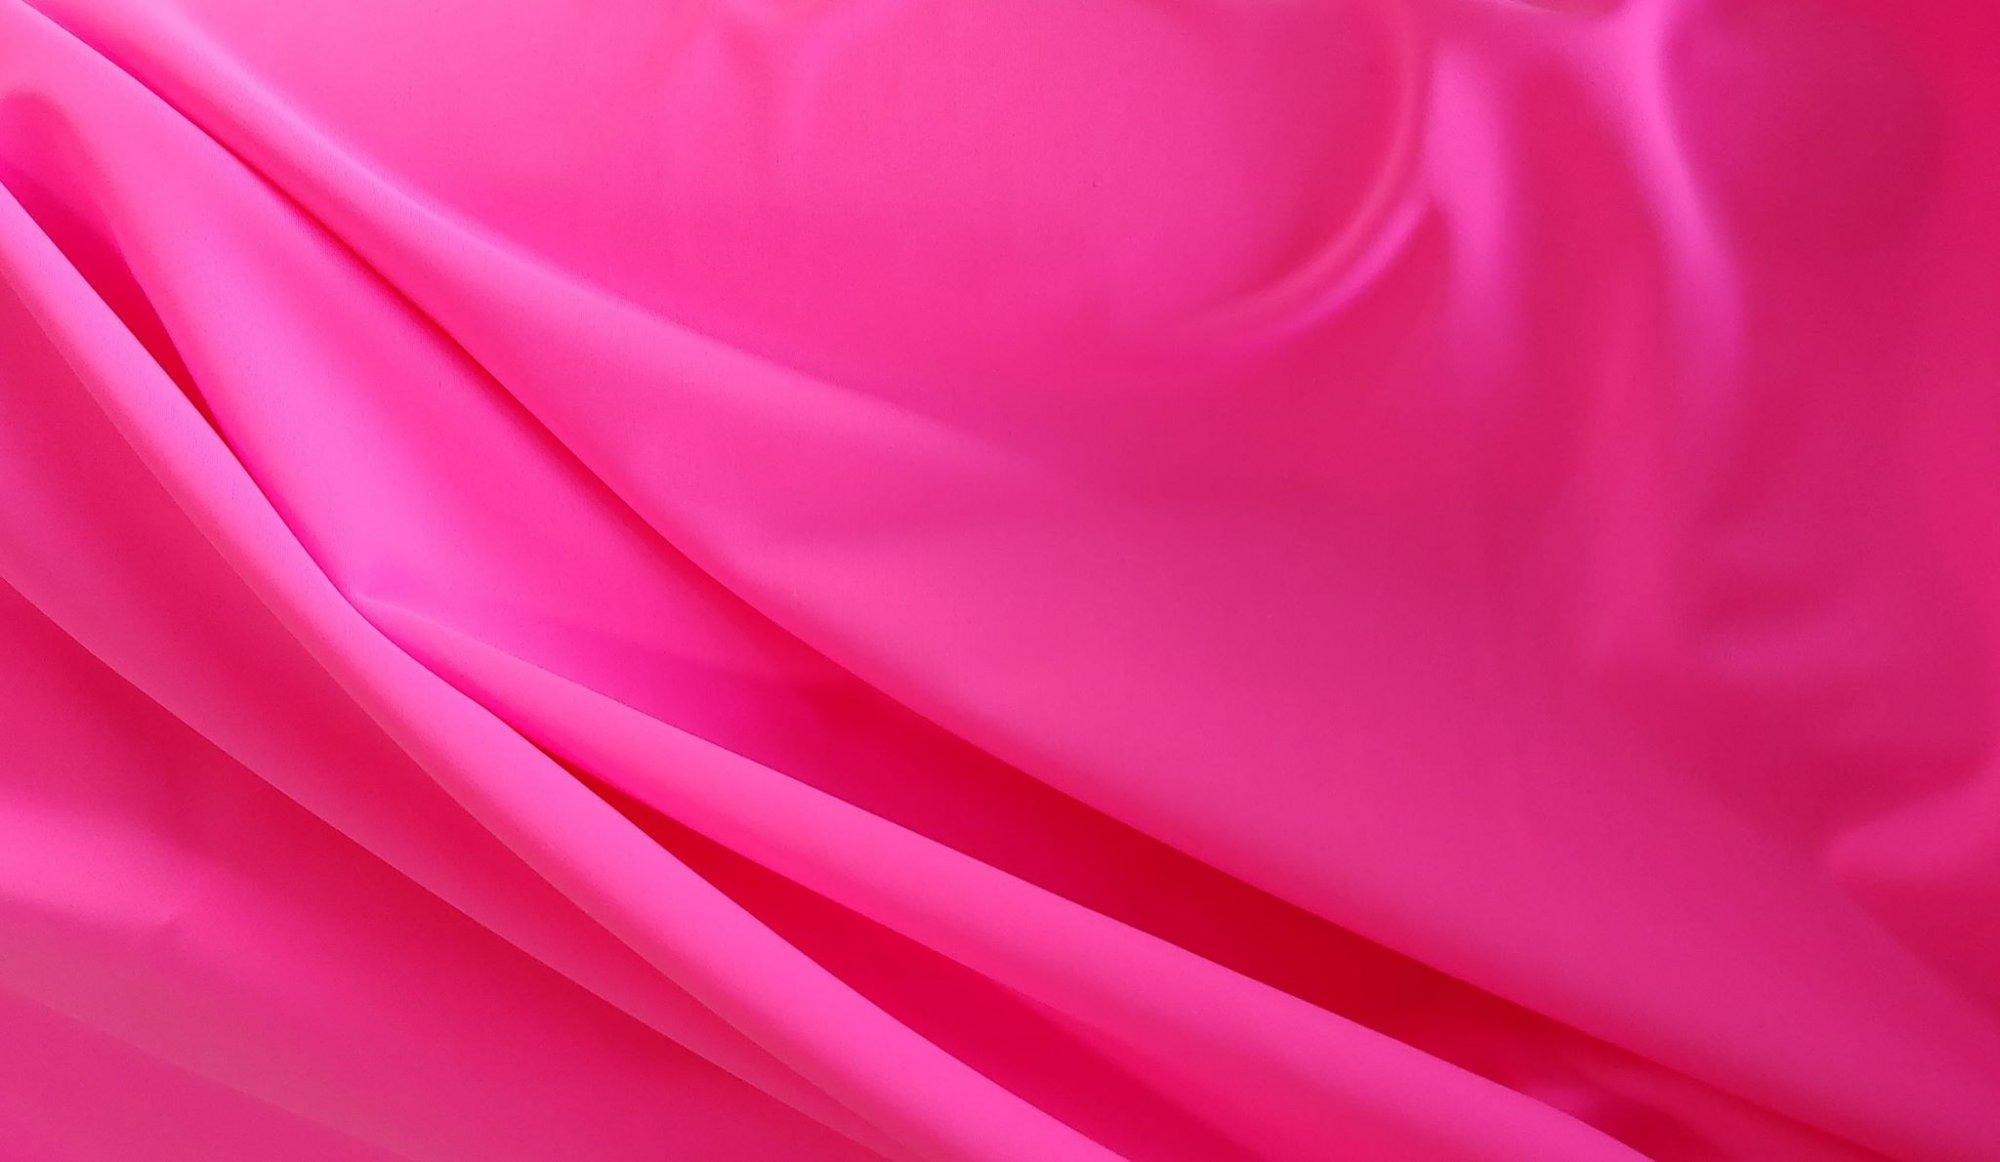 Neon Pink Nylon/Spandex